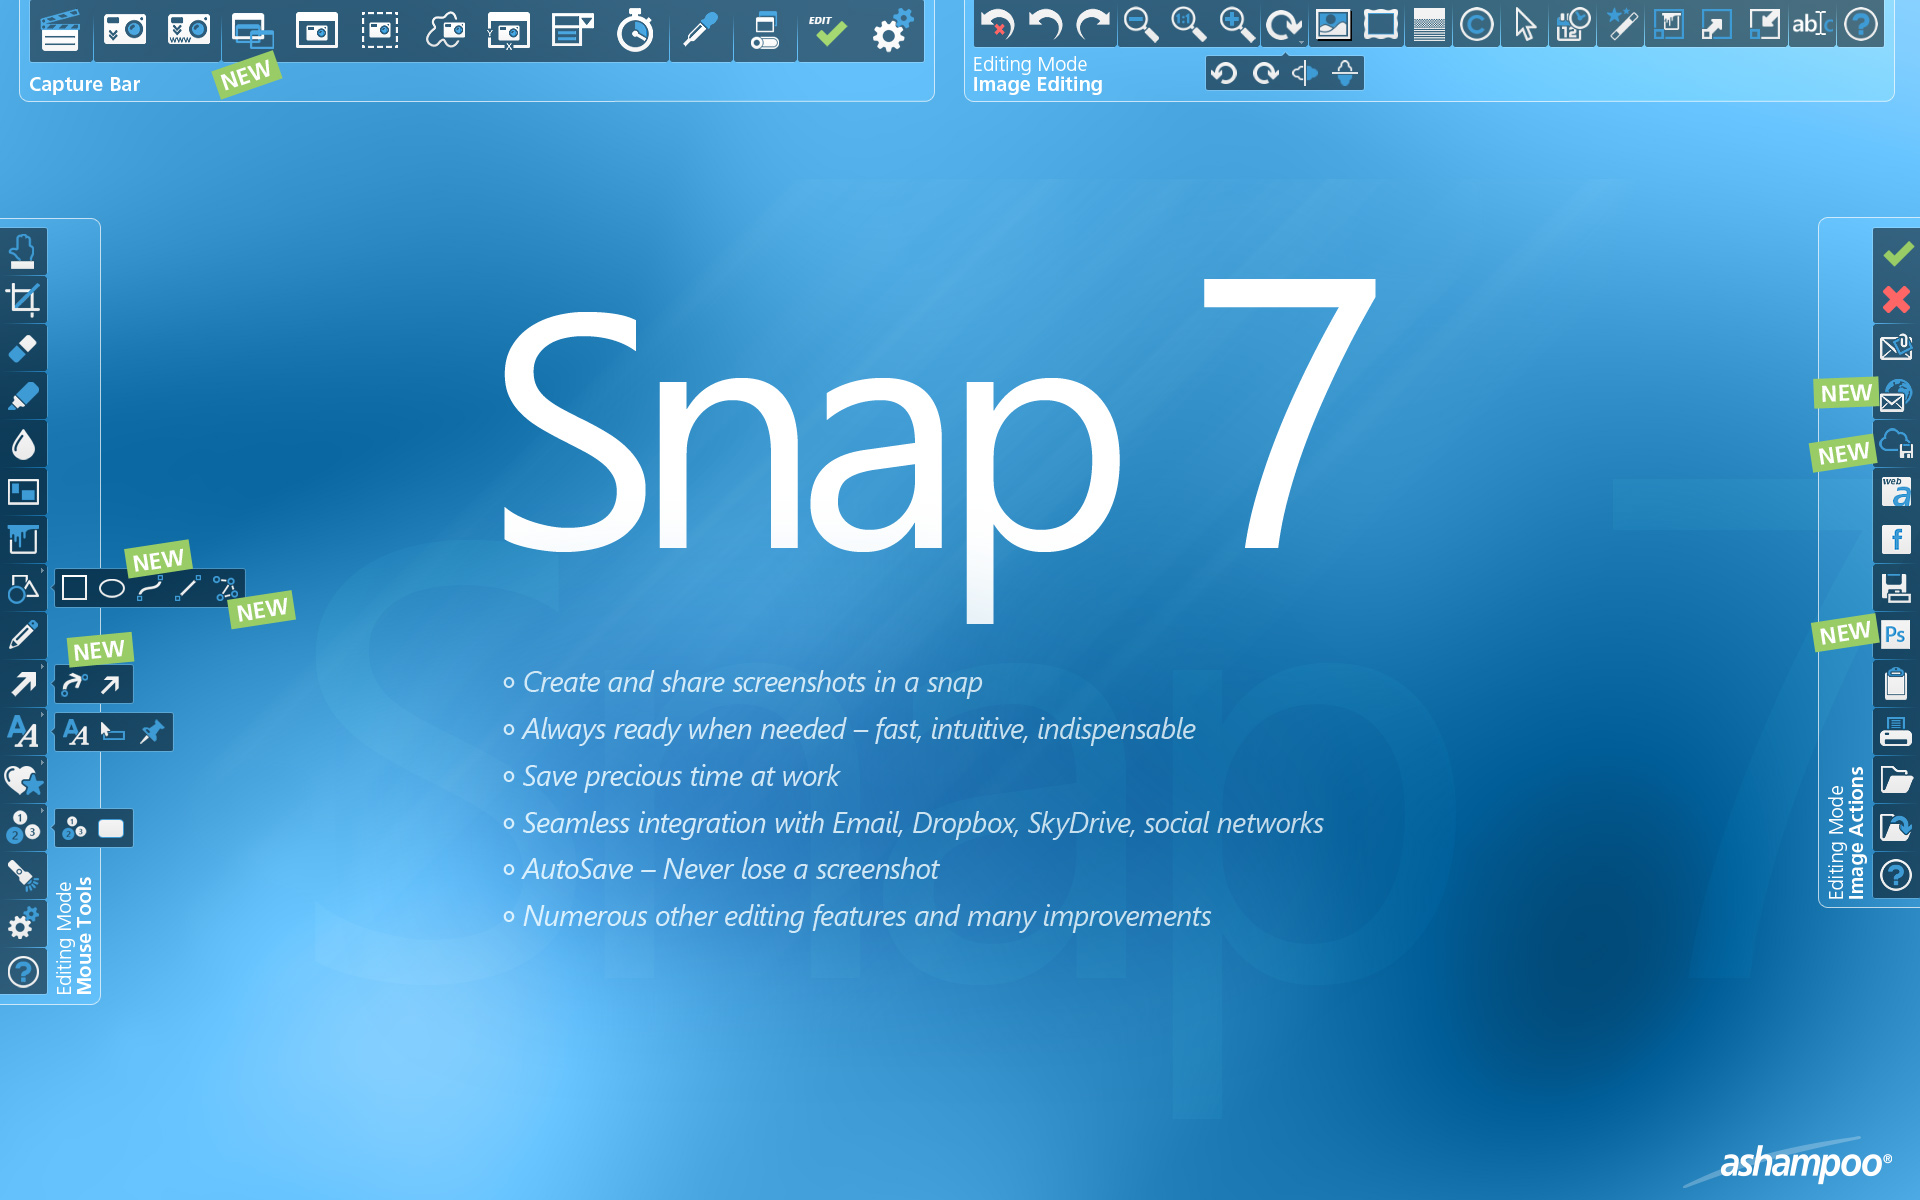 scr overview snap7 en - Ashampoo Snap 7 ( Kampanya )